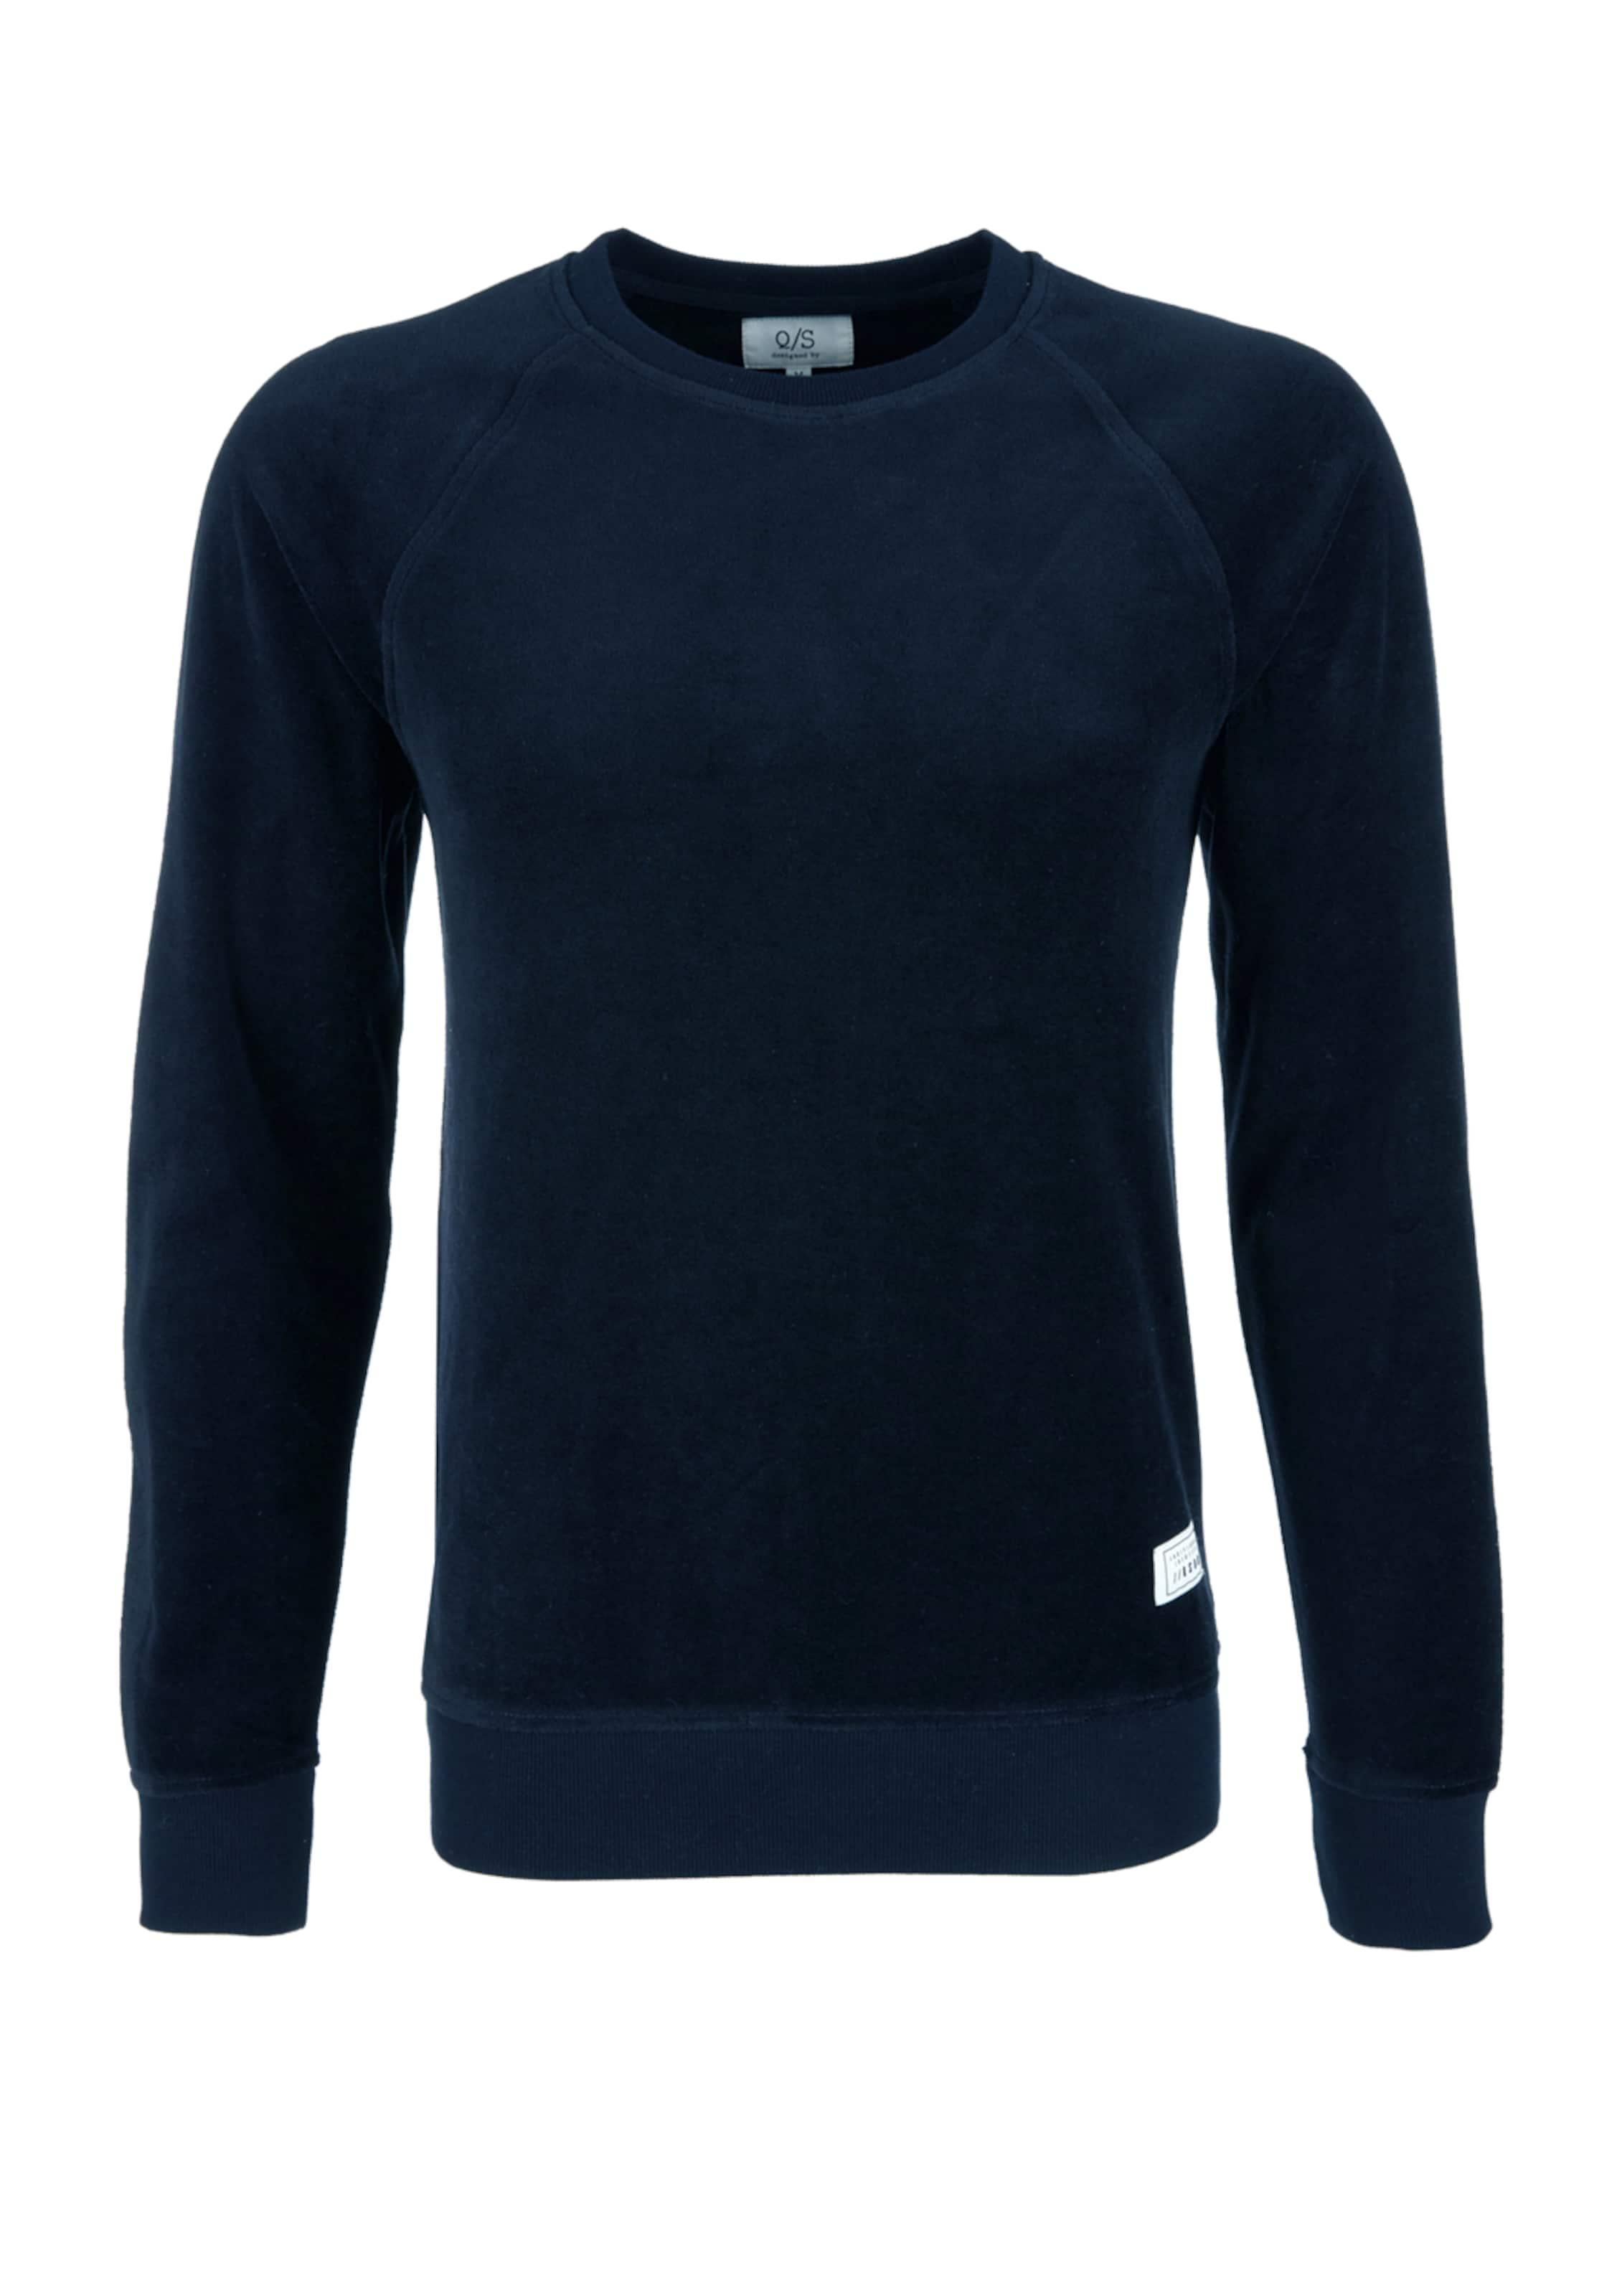 Q Sweatshirt Navy 'nicki' s By In Designed FKc3l1JuT